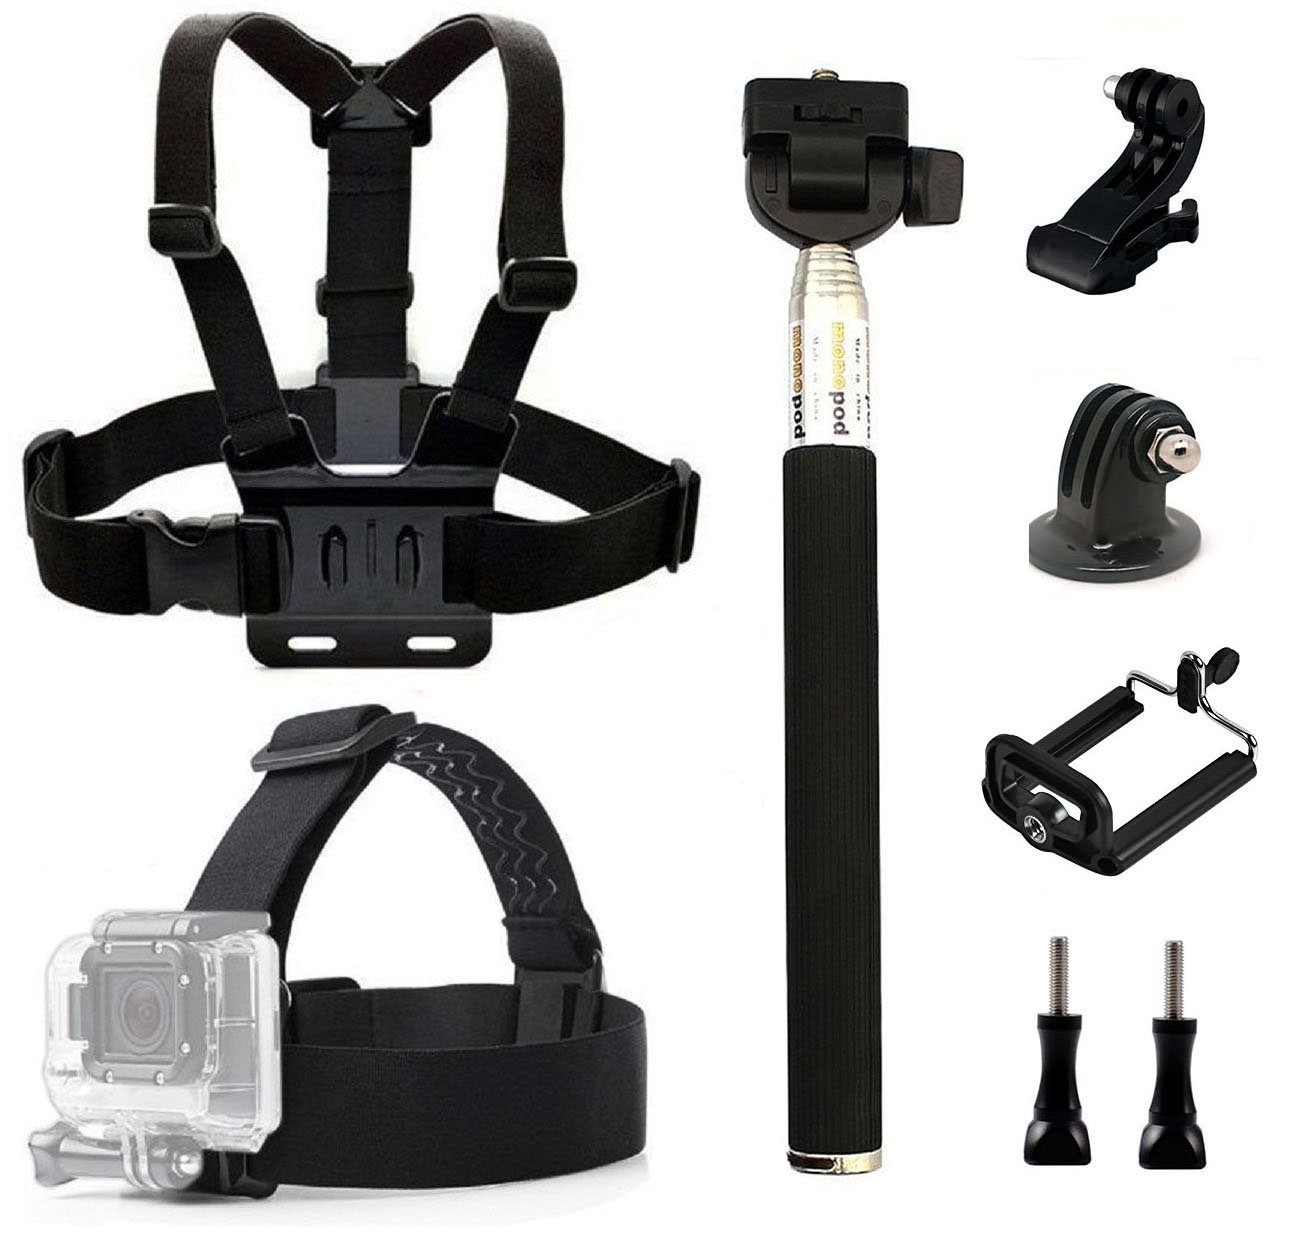 dOvOb Action Camera Accessories Kit included Head Strap Mount+ Chest Belt Strap Harness+ Selfie Stick Handheld Monopod for GoPro Hero 6/ APEMAN / AKASO / DBPOWER / Campark / EKEN / Lightdow /Xiao Yi